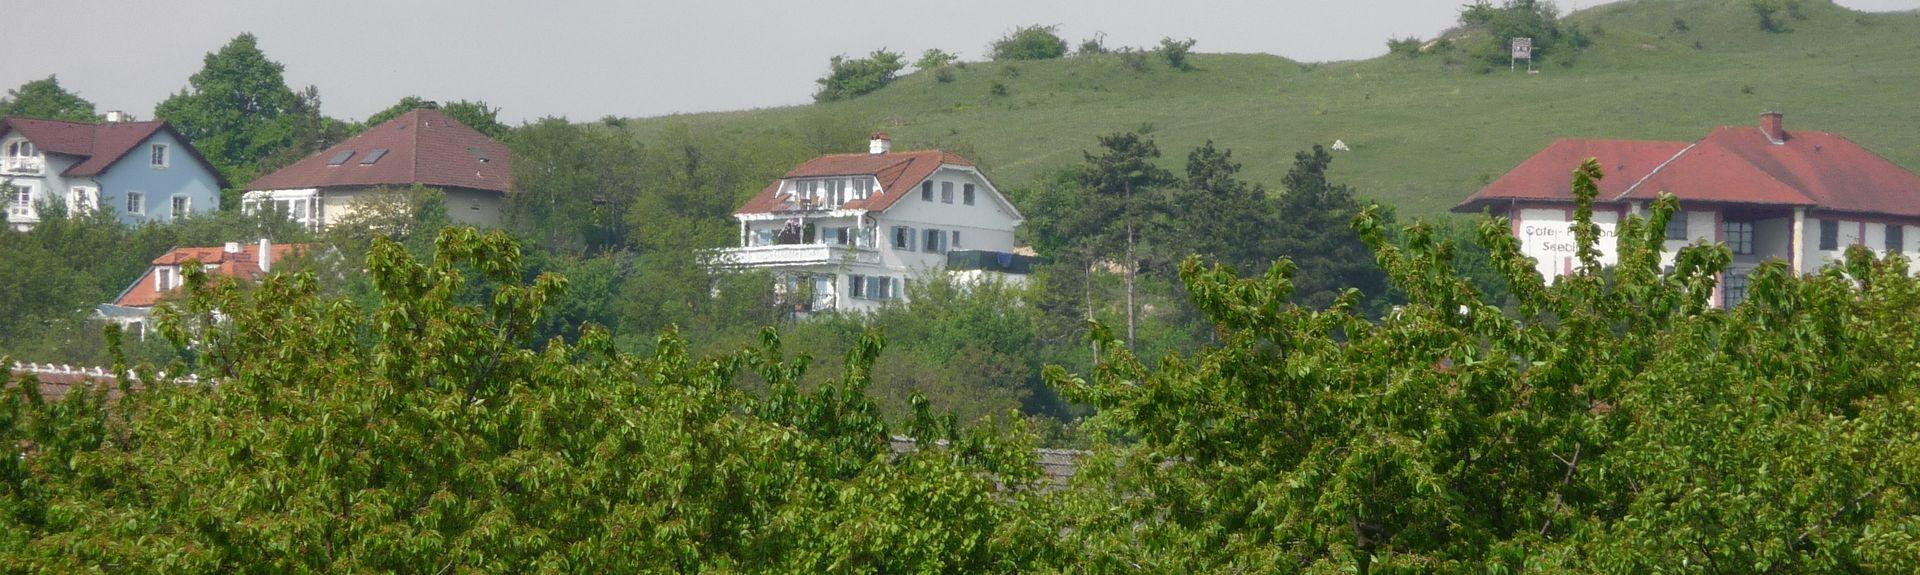 Ebreichsdorf, Nedre Østrig, Østrig